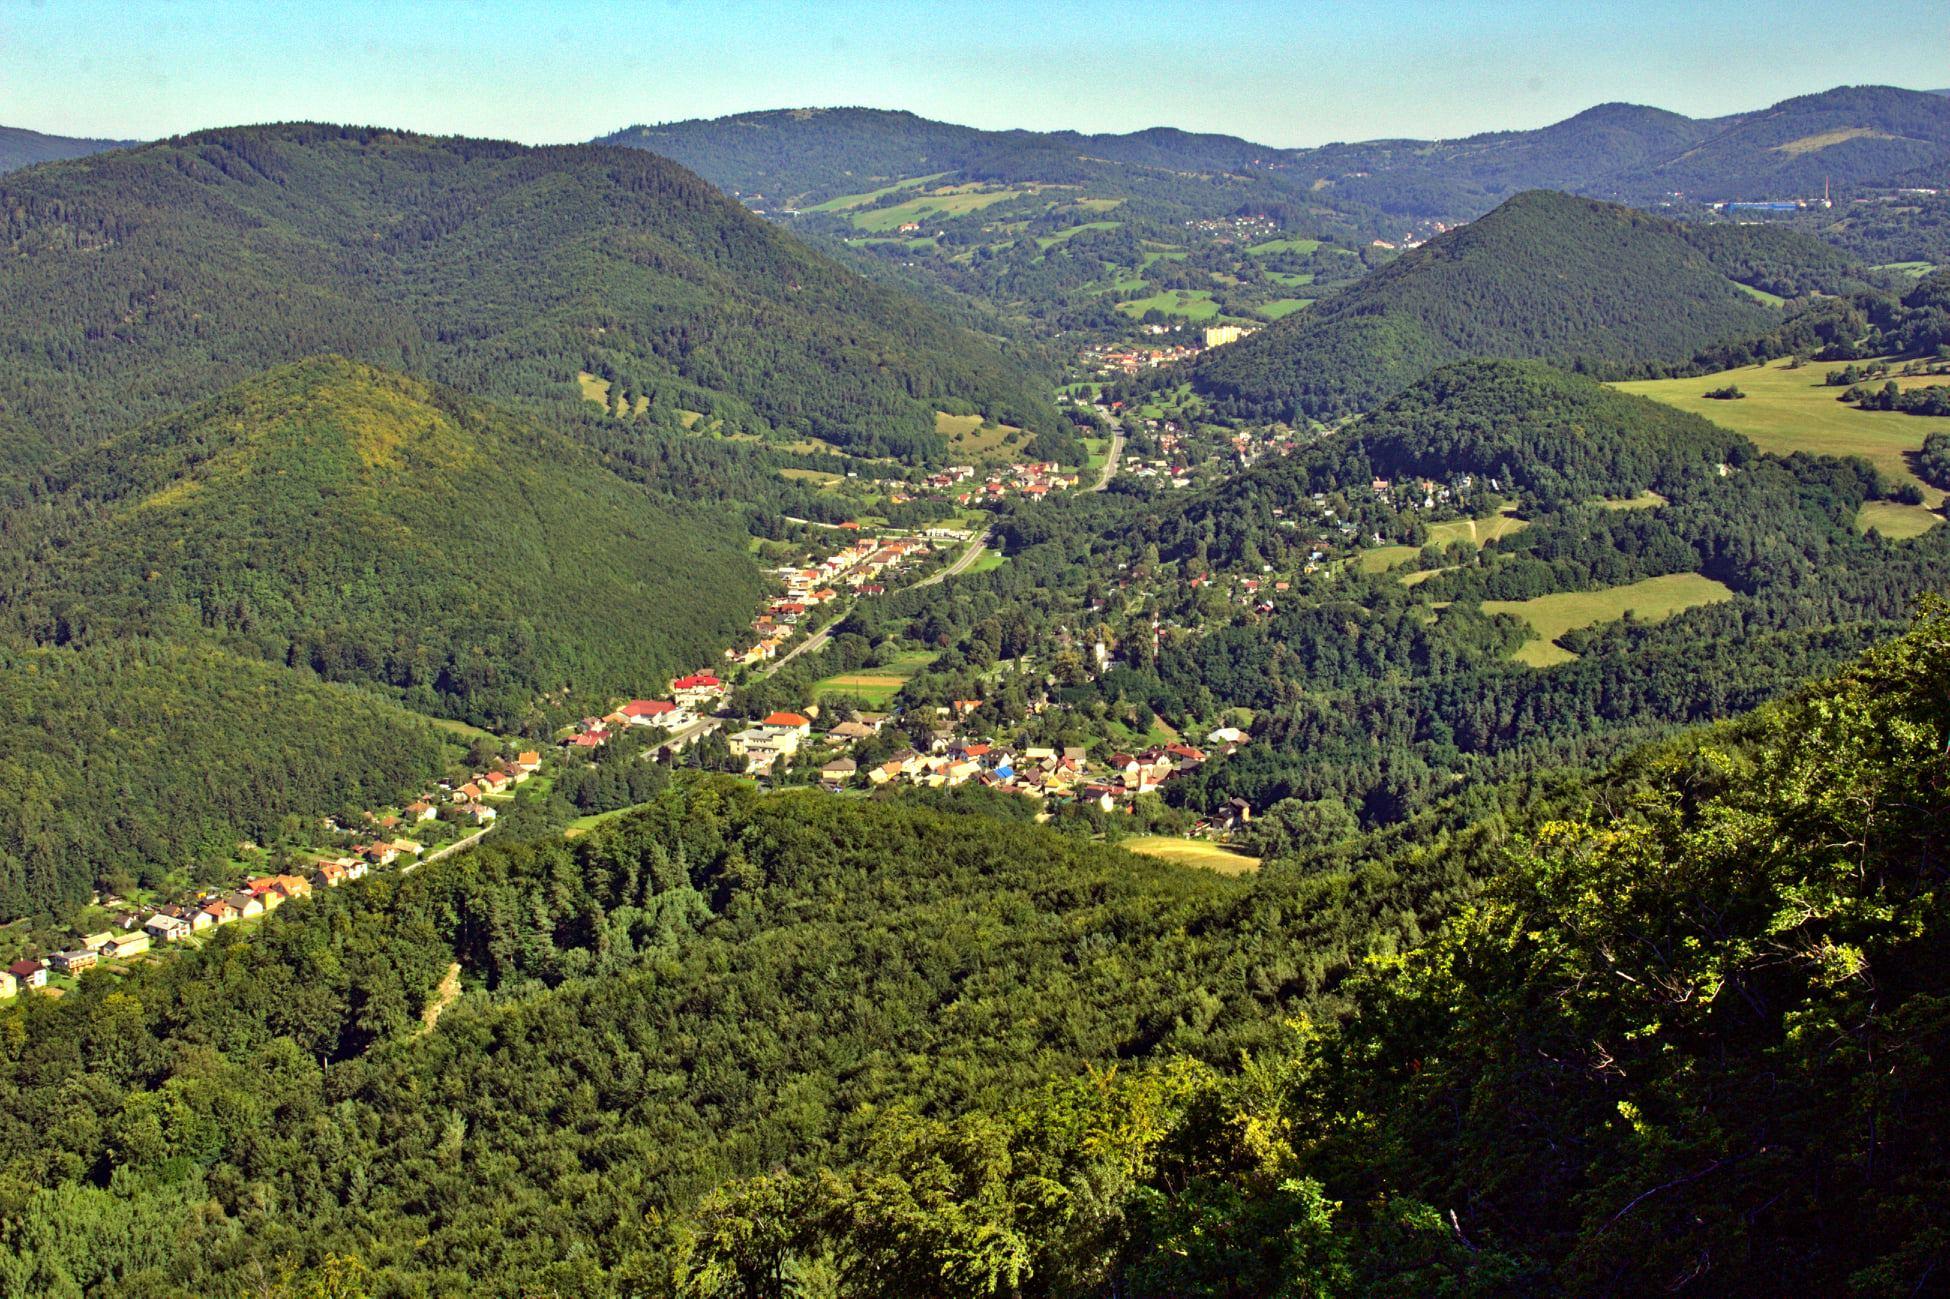 Kremnické vrchy: Jastrabská skala (684 m n. m.)